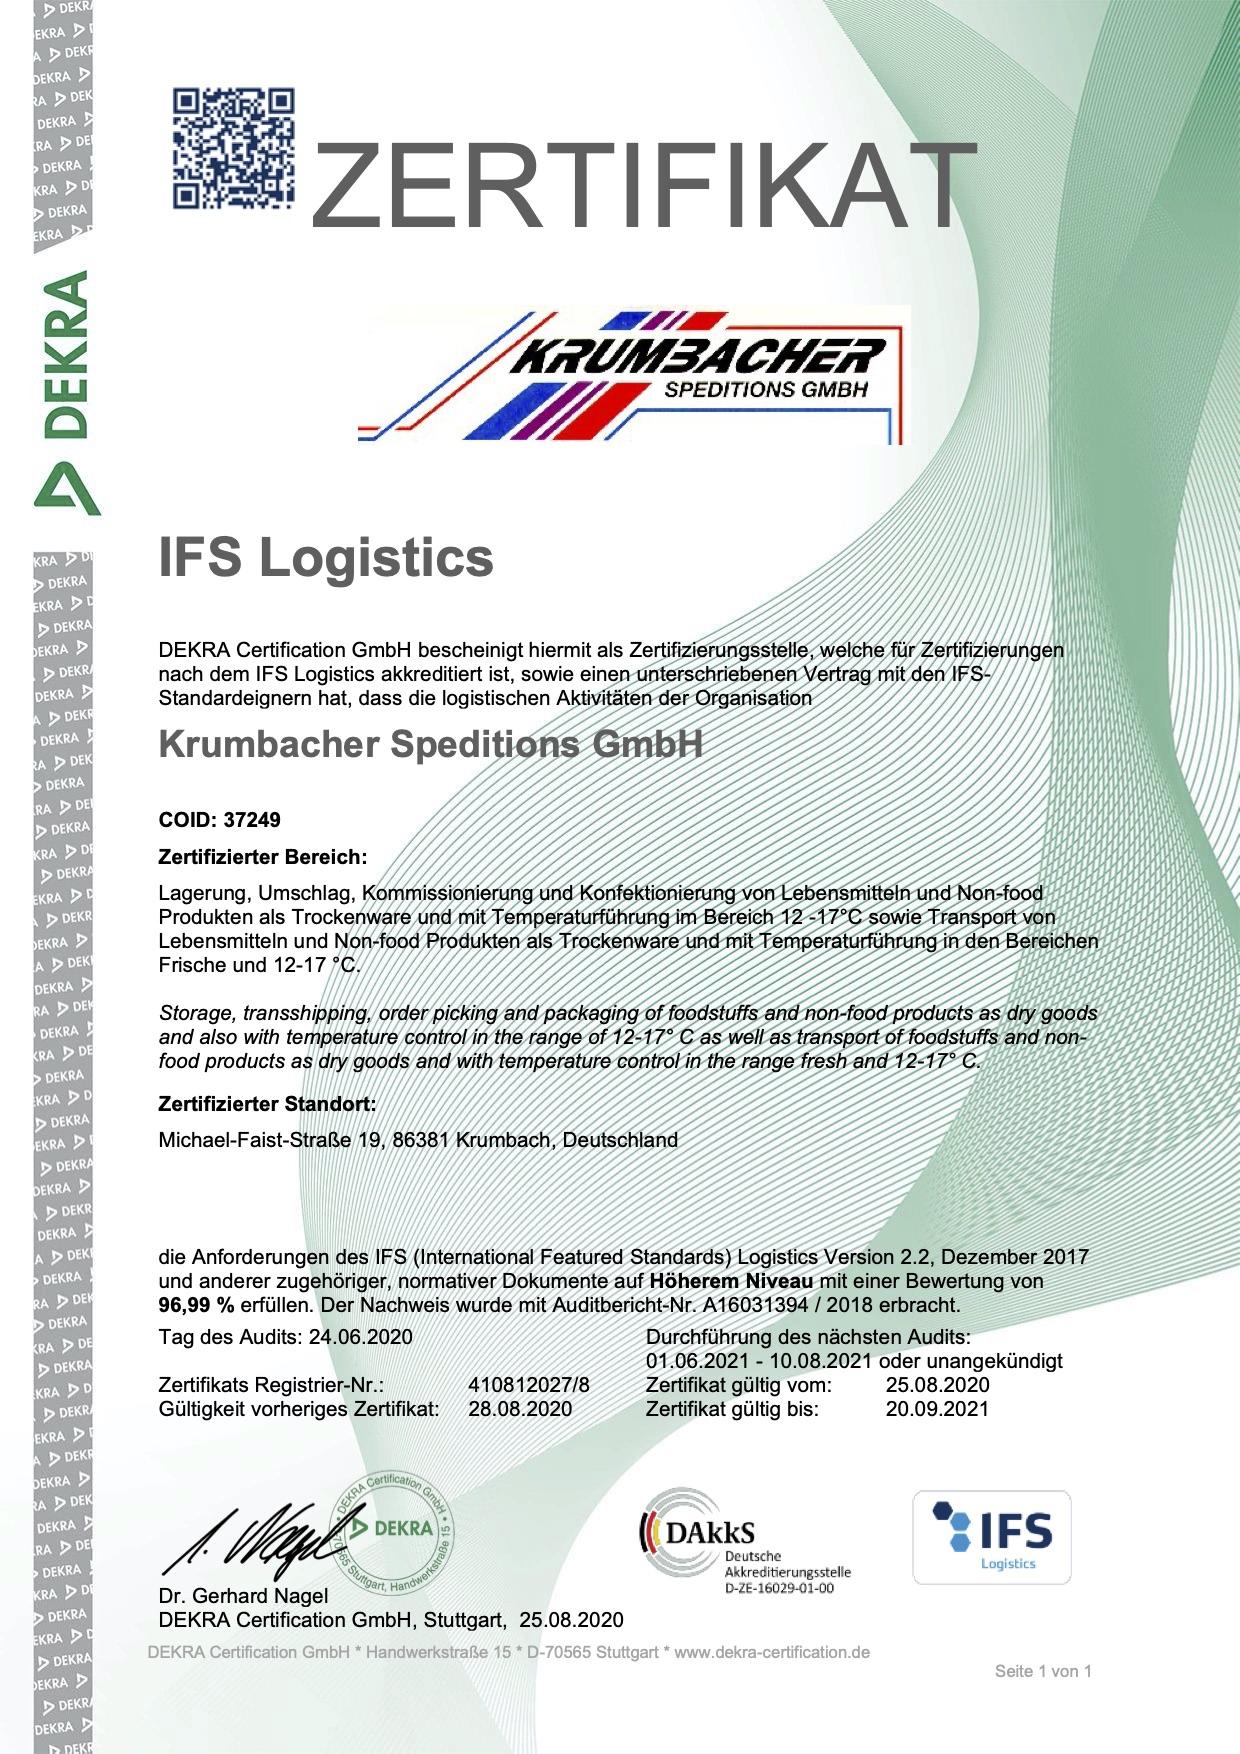 ifs-logistik-zertifikat-krumbach